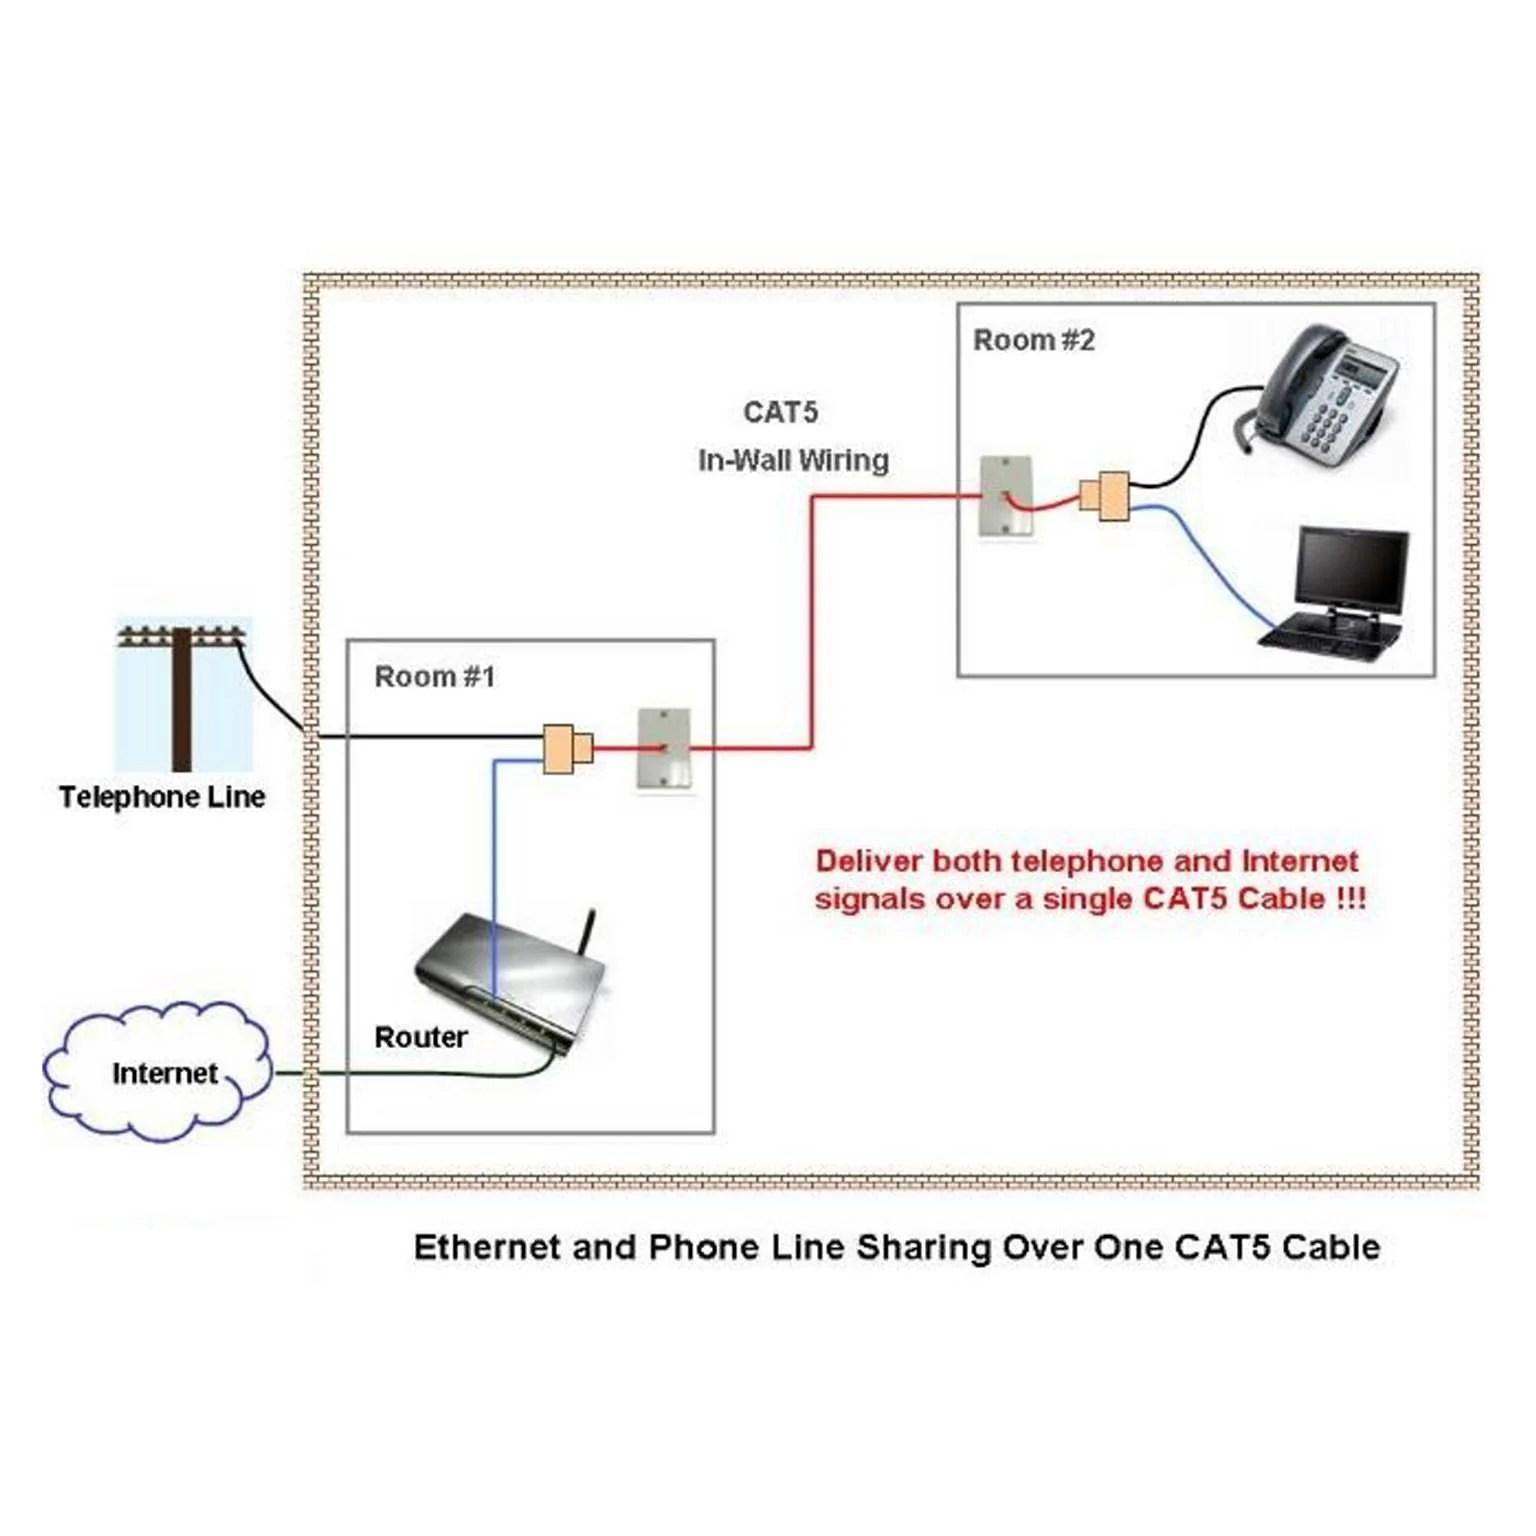 ethernet phone wiring diagram wiring diagram ameethernet phone wiring diagram wiring diagram fascinating ethernet phone wiring [ 1536 x 1536 Pixel ]